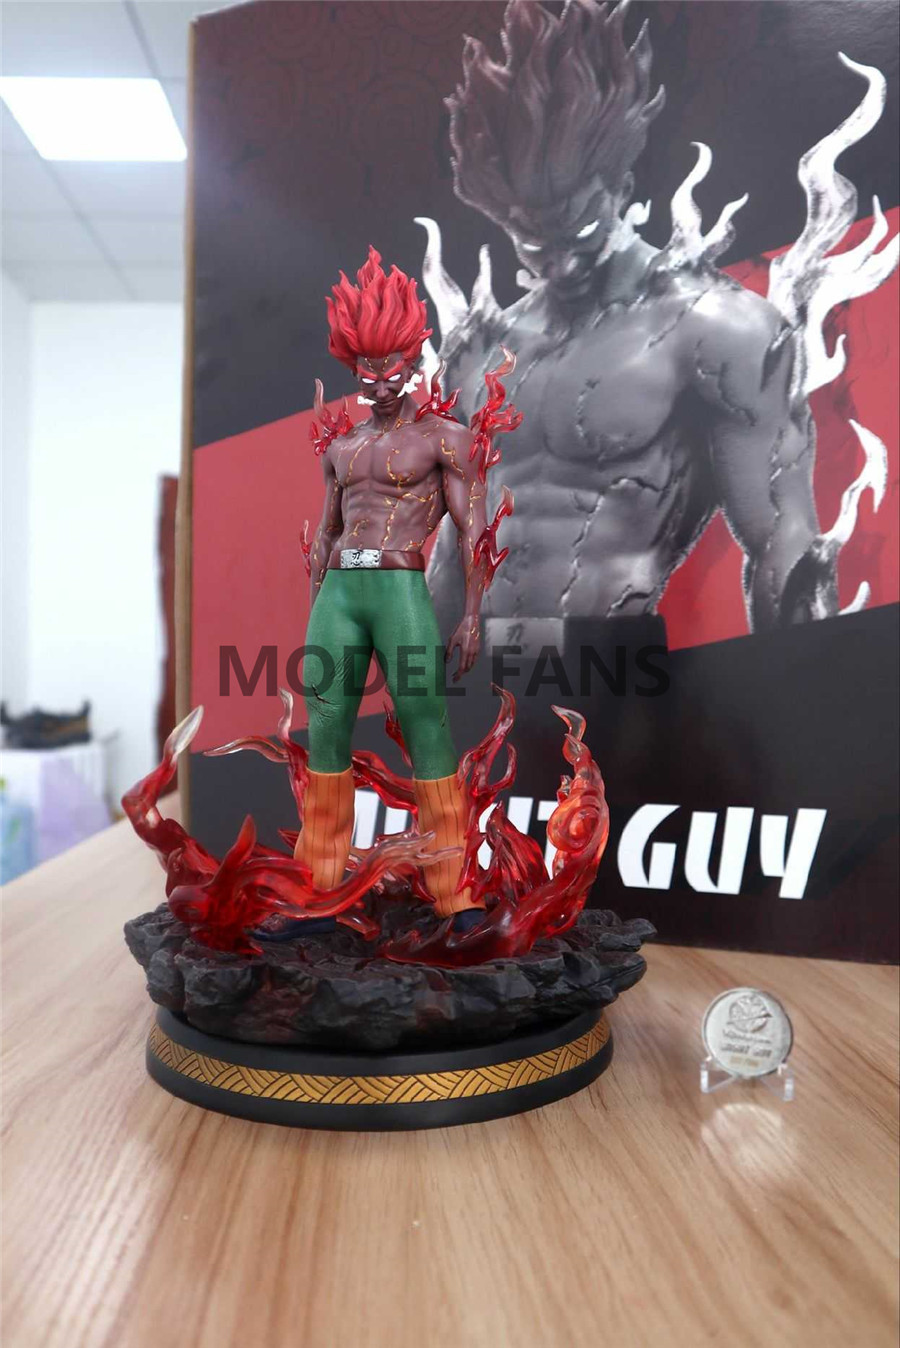 Naruto0 JZ Might Guy Resin Model Figure Painted Statue Dragon Studio Led Light